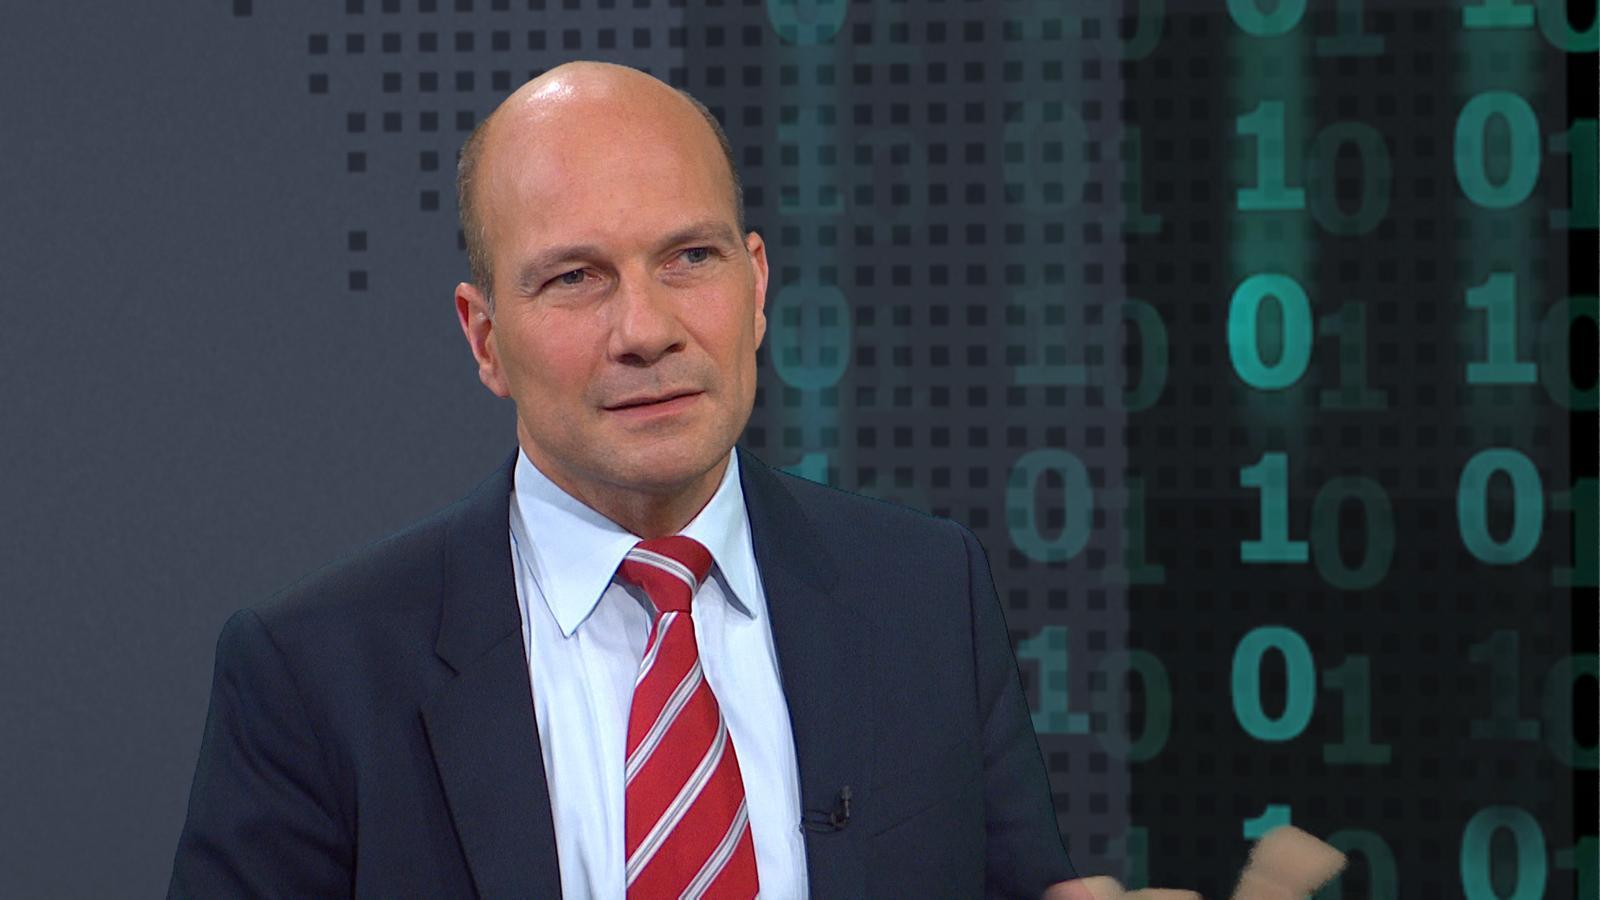 Datenschutzbeauftragter Bayern